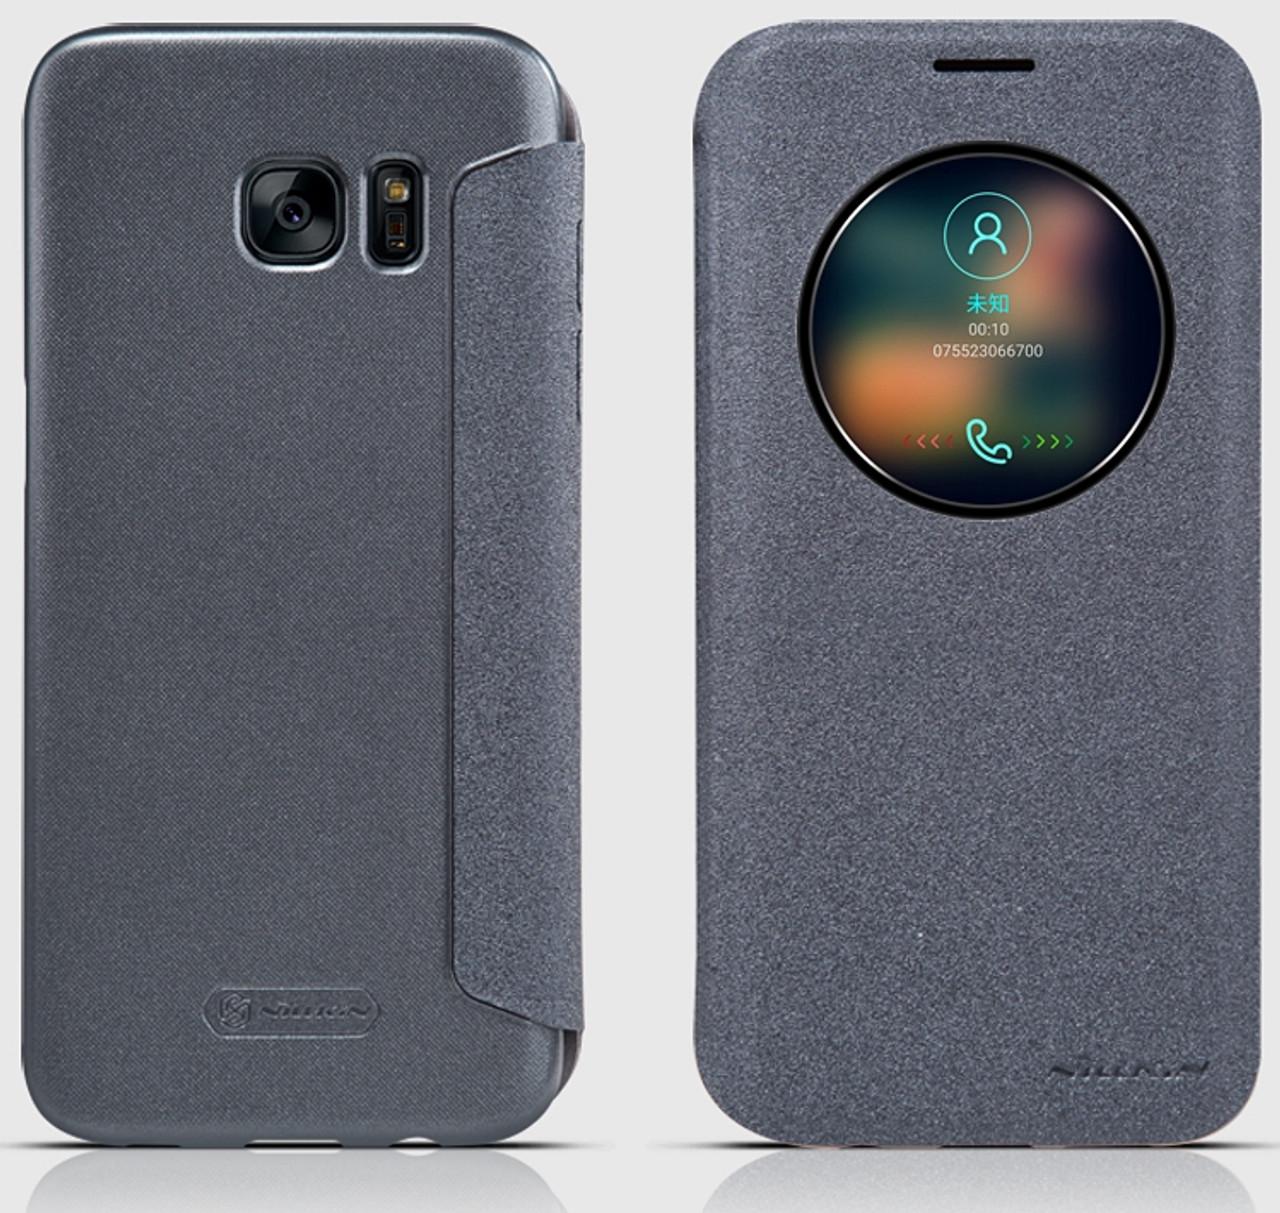 official photos 482c9 559ac Nillkin Samsung Galaxy S7 EDGE App Window Smart Case